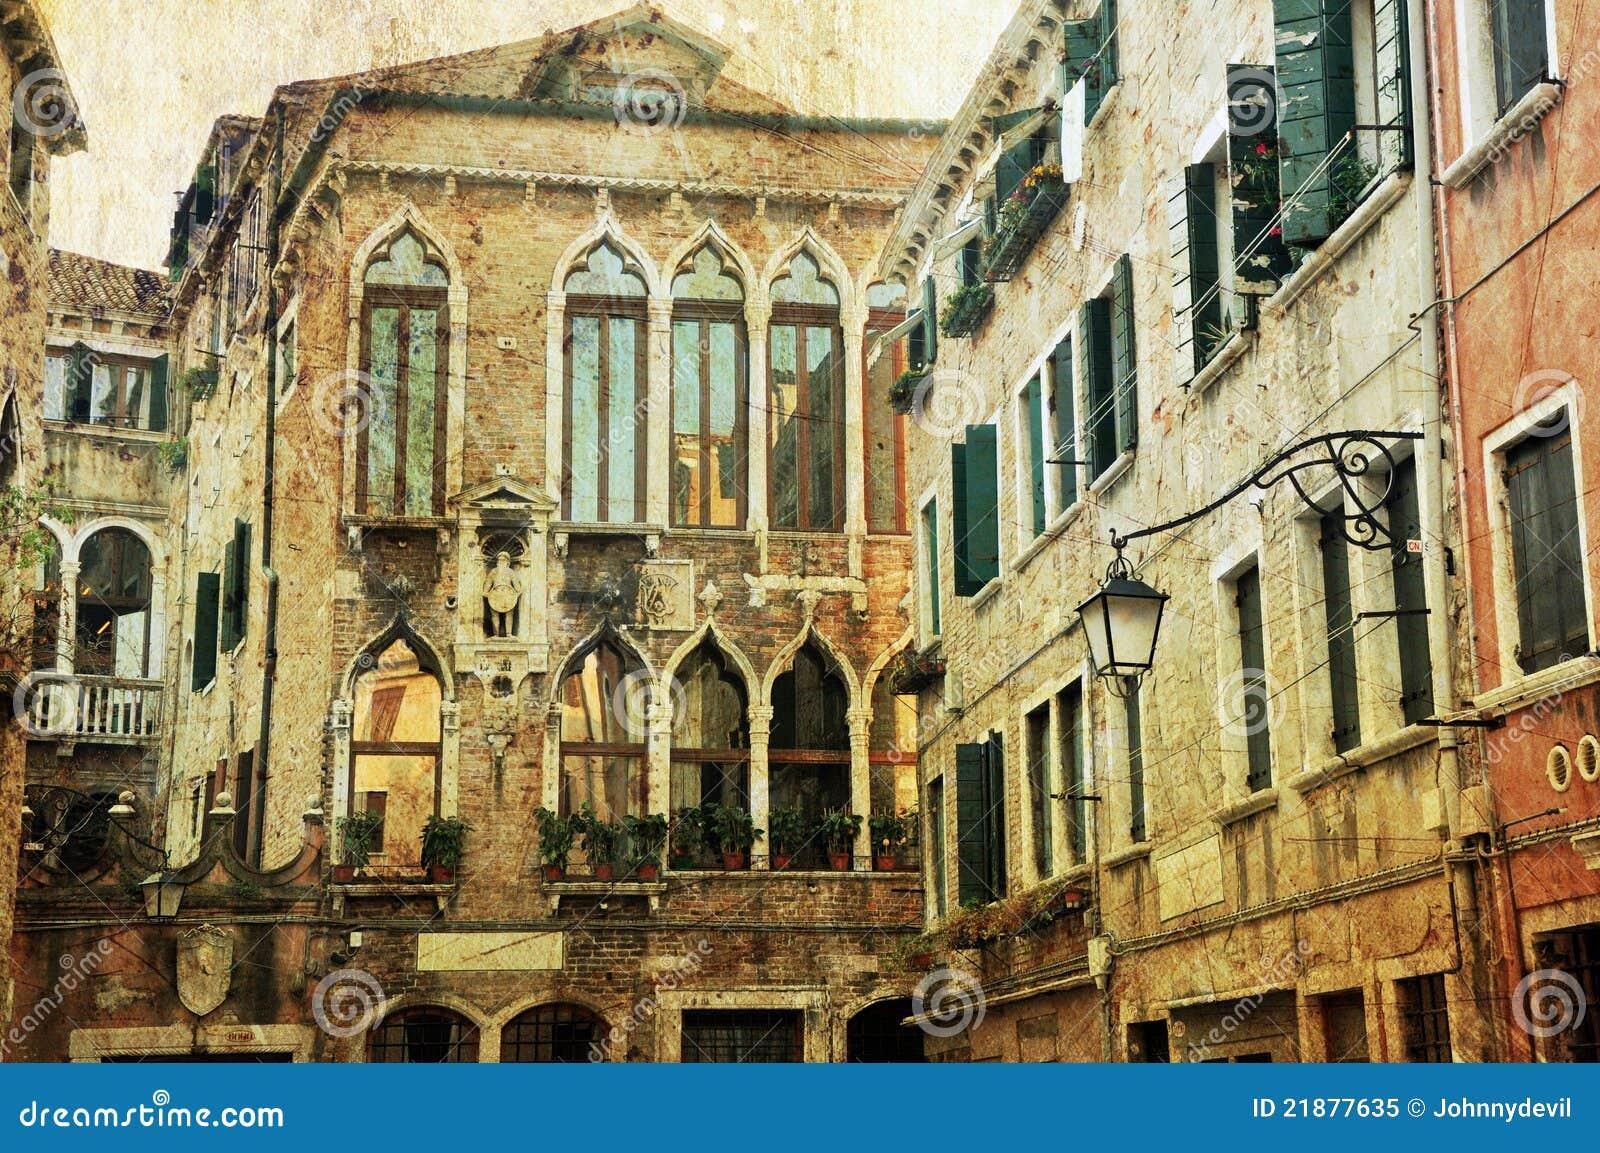 venetian architecture stock photography cartoondealer